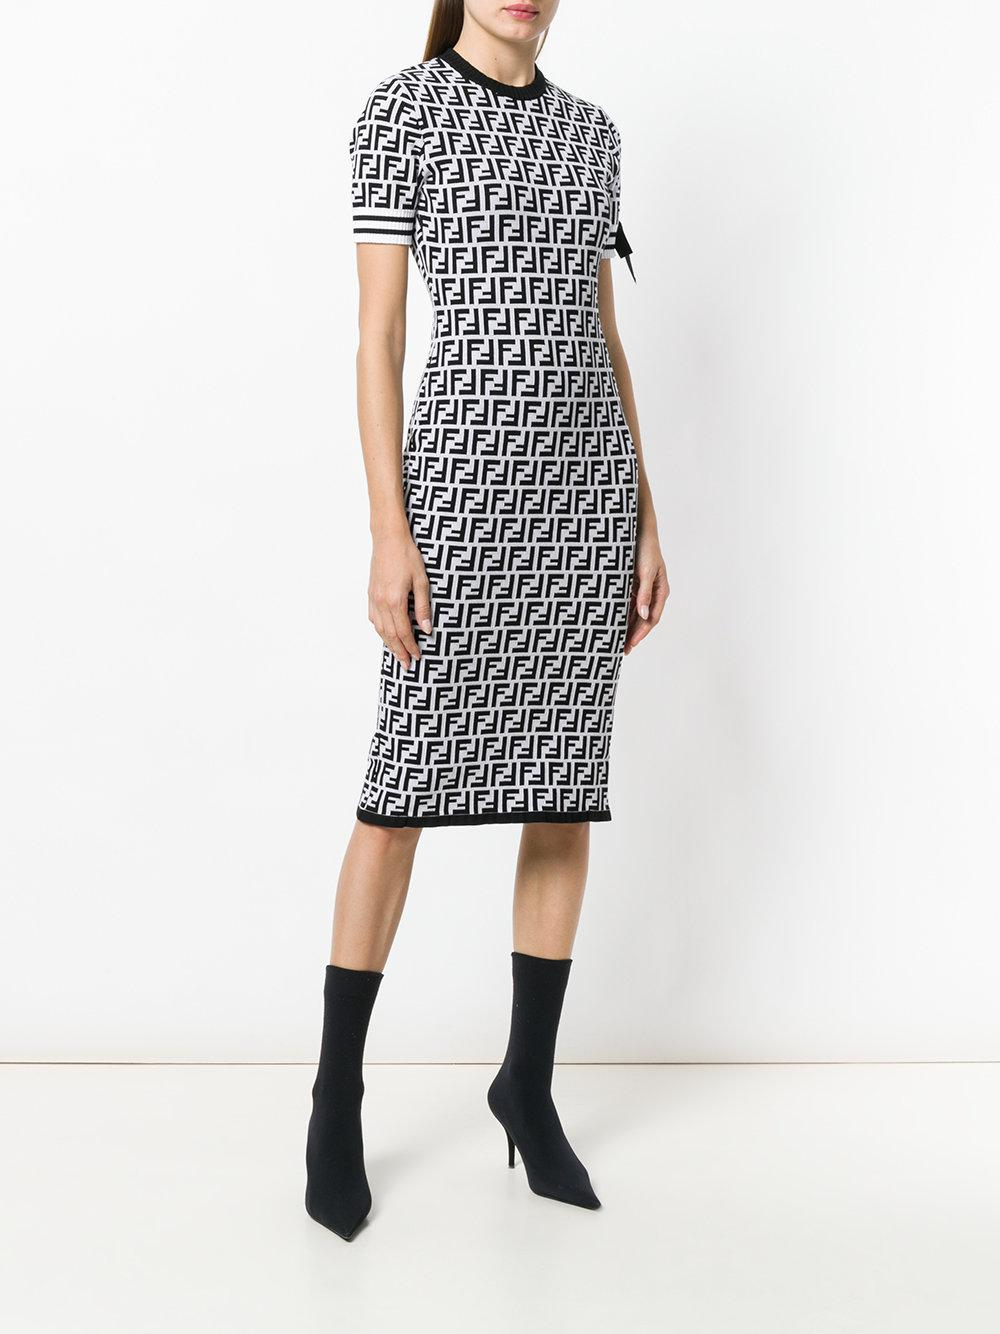 347dab27d62 Fendi Logo Short-sleeve Sweater Dress in Black - Lyst